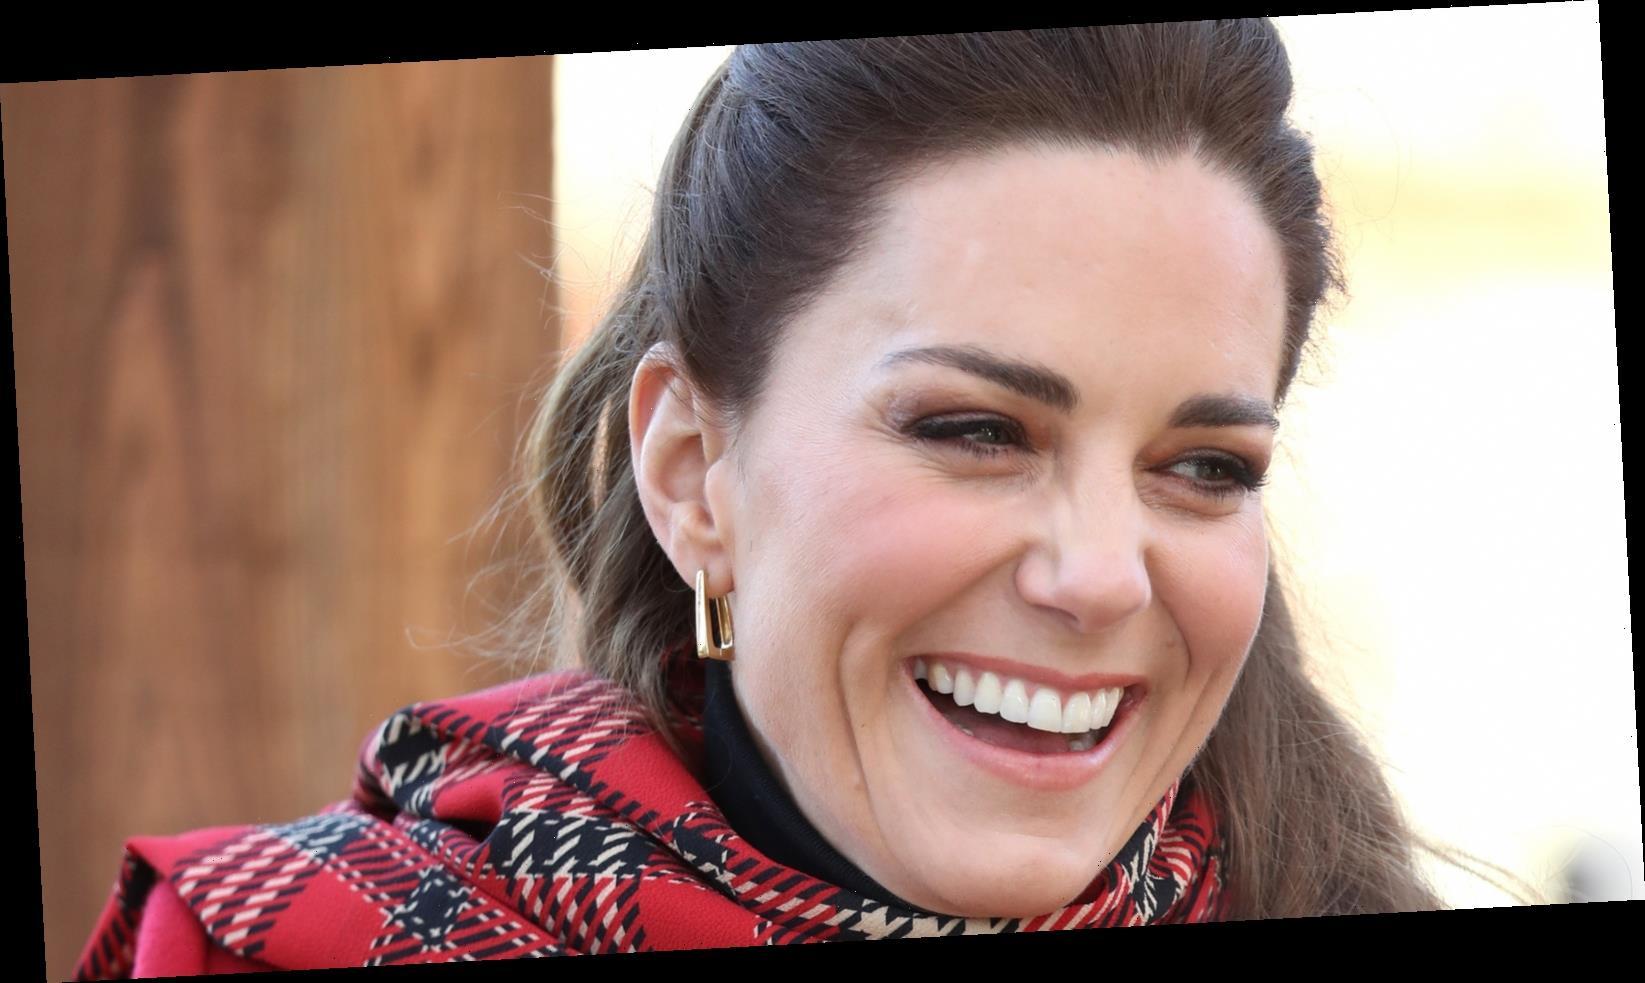 Strange Facts About Kate Middleton